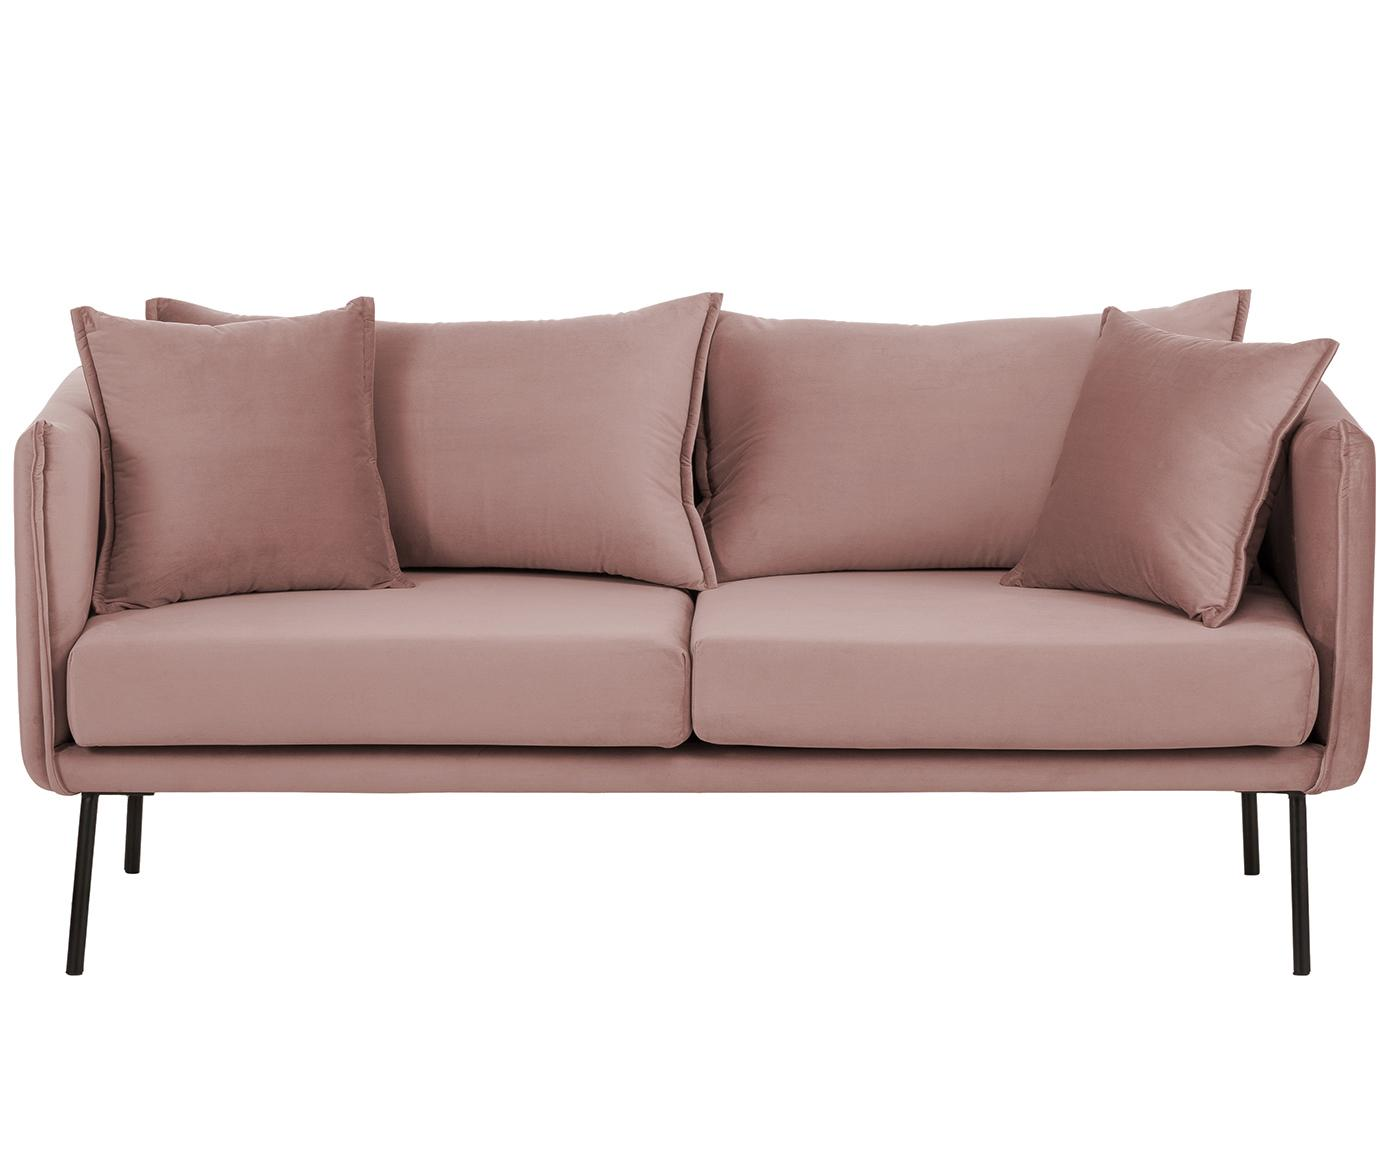 Samt-Sofa Ivy (2-Sitzer), Bezug: Samt (Polyester) 15.000 S, Gestell: Metall, Bezug: Rosa Füsse: Schwarz, B 170 x T 75 cm